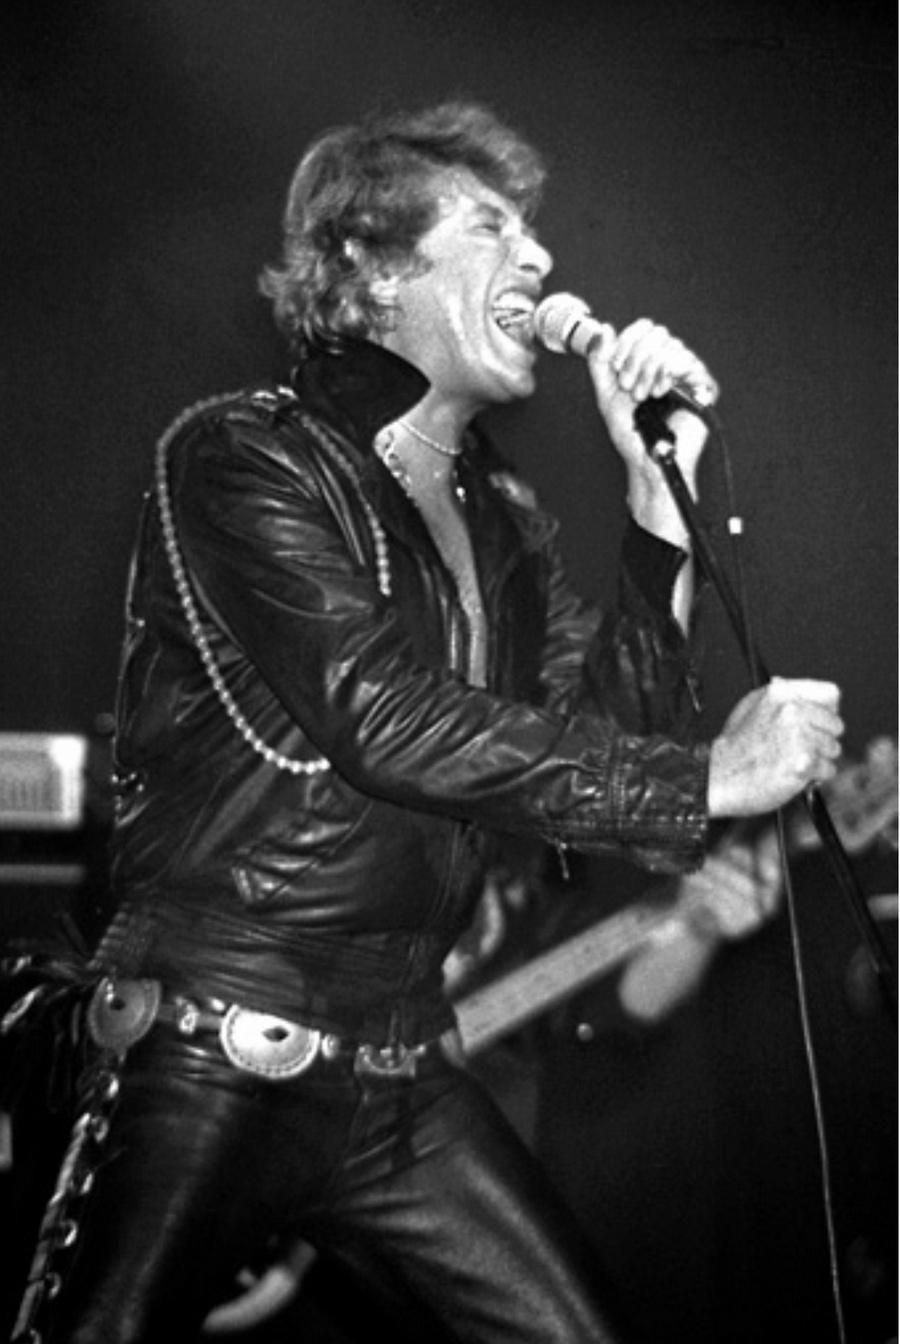 LES CONCERTS DE JOHNNY 'TOURNEE NIGHT RIDER BAND TOUR 1981' Captu905